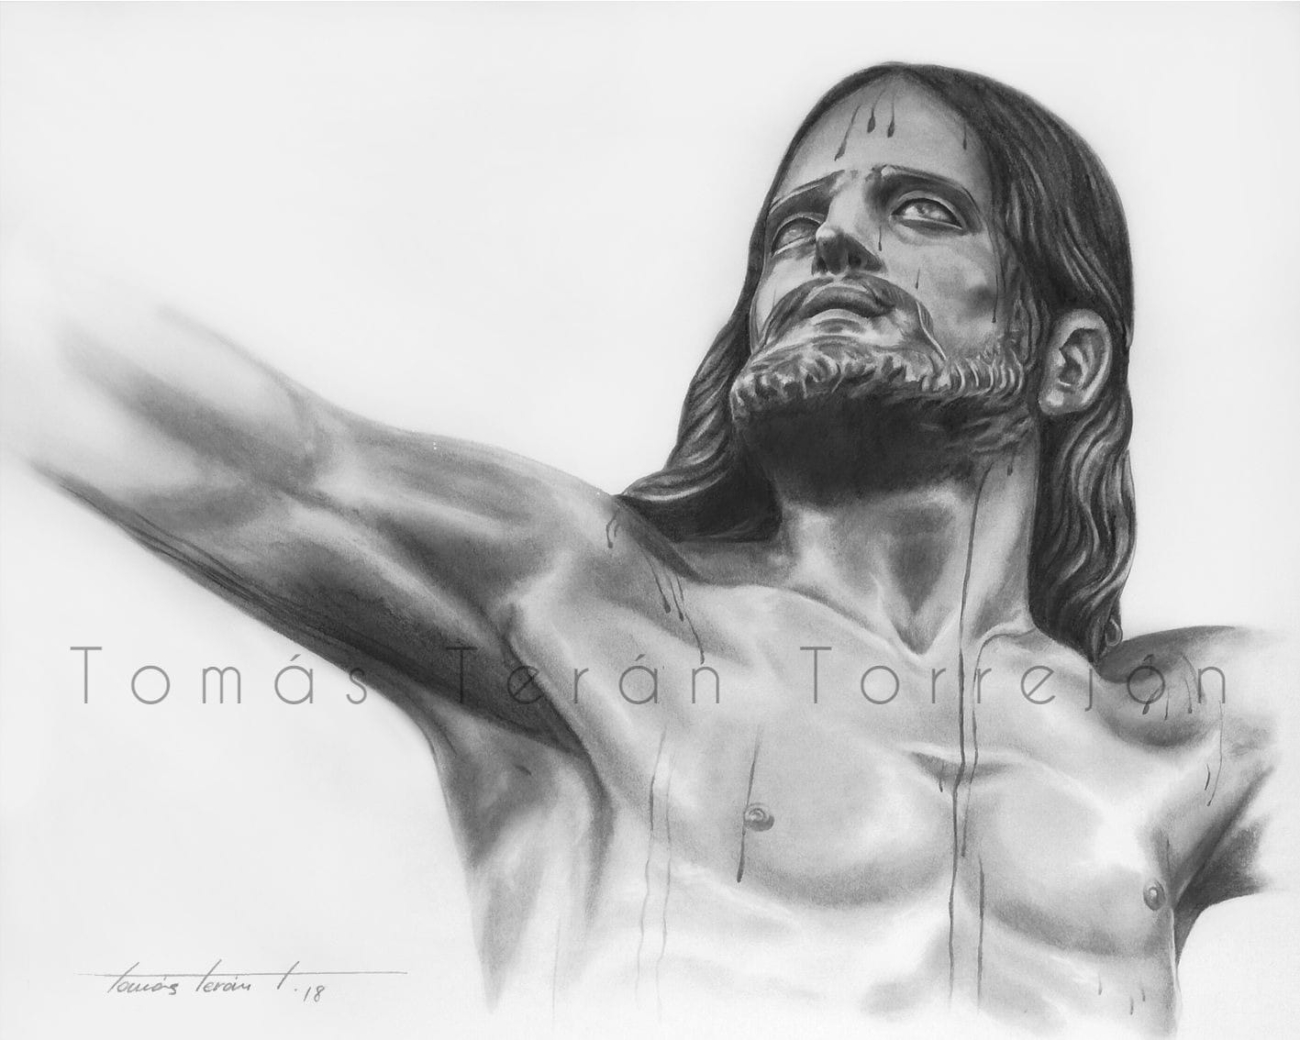 Cristo de la Expiración Tomás Terán